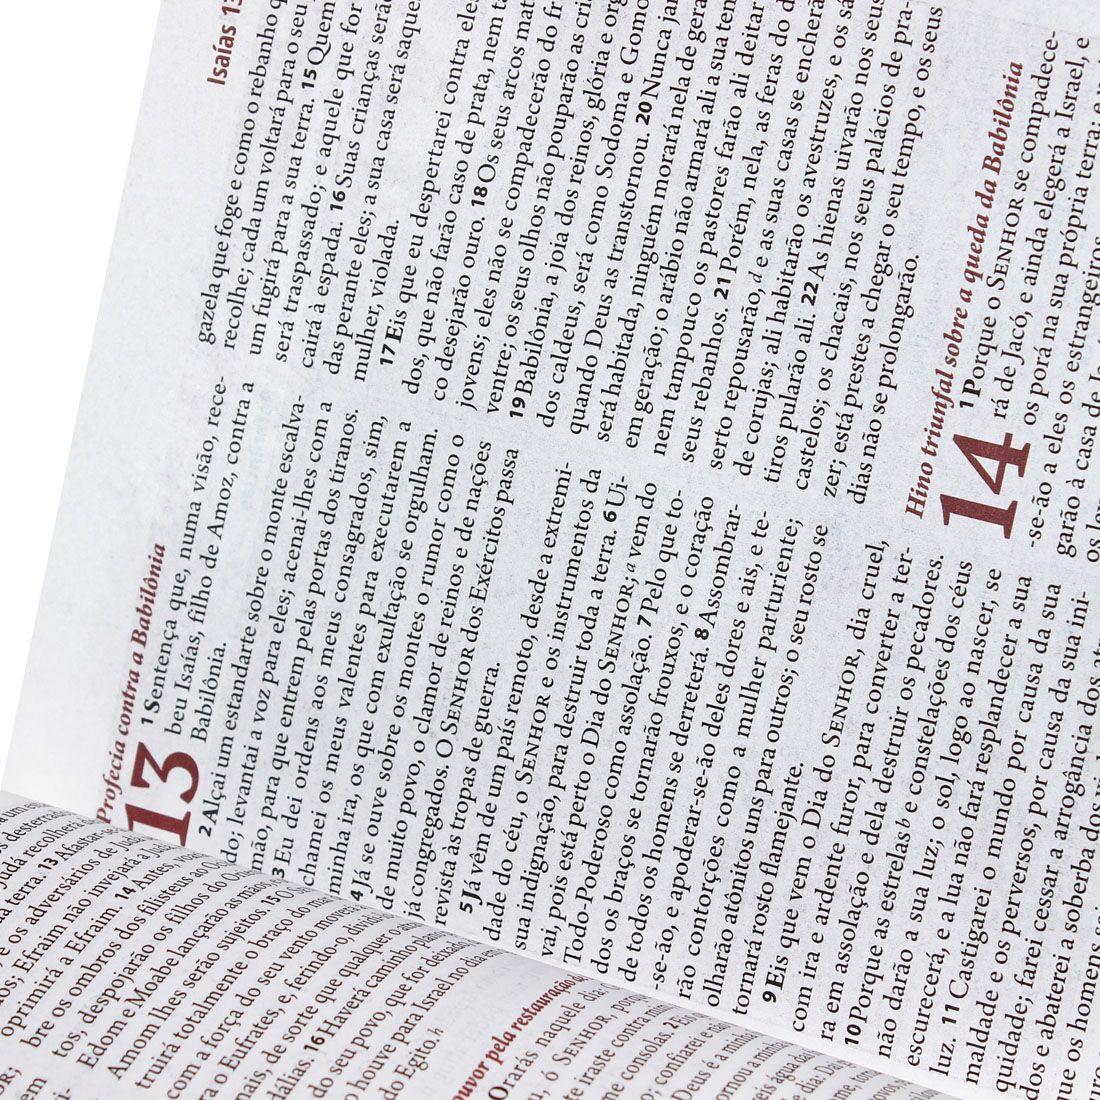 Kit Bíblia Sagrada Feminina Capa Branca Com Flôr + Bíblia Descobertas p/ Adolescentes Capa Jeans